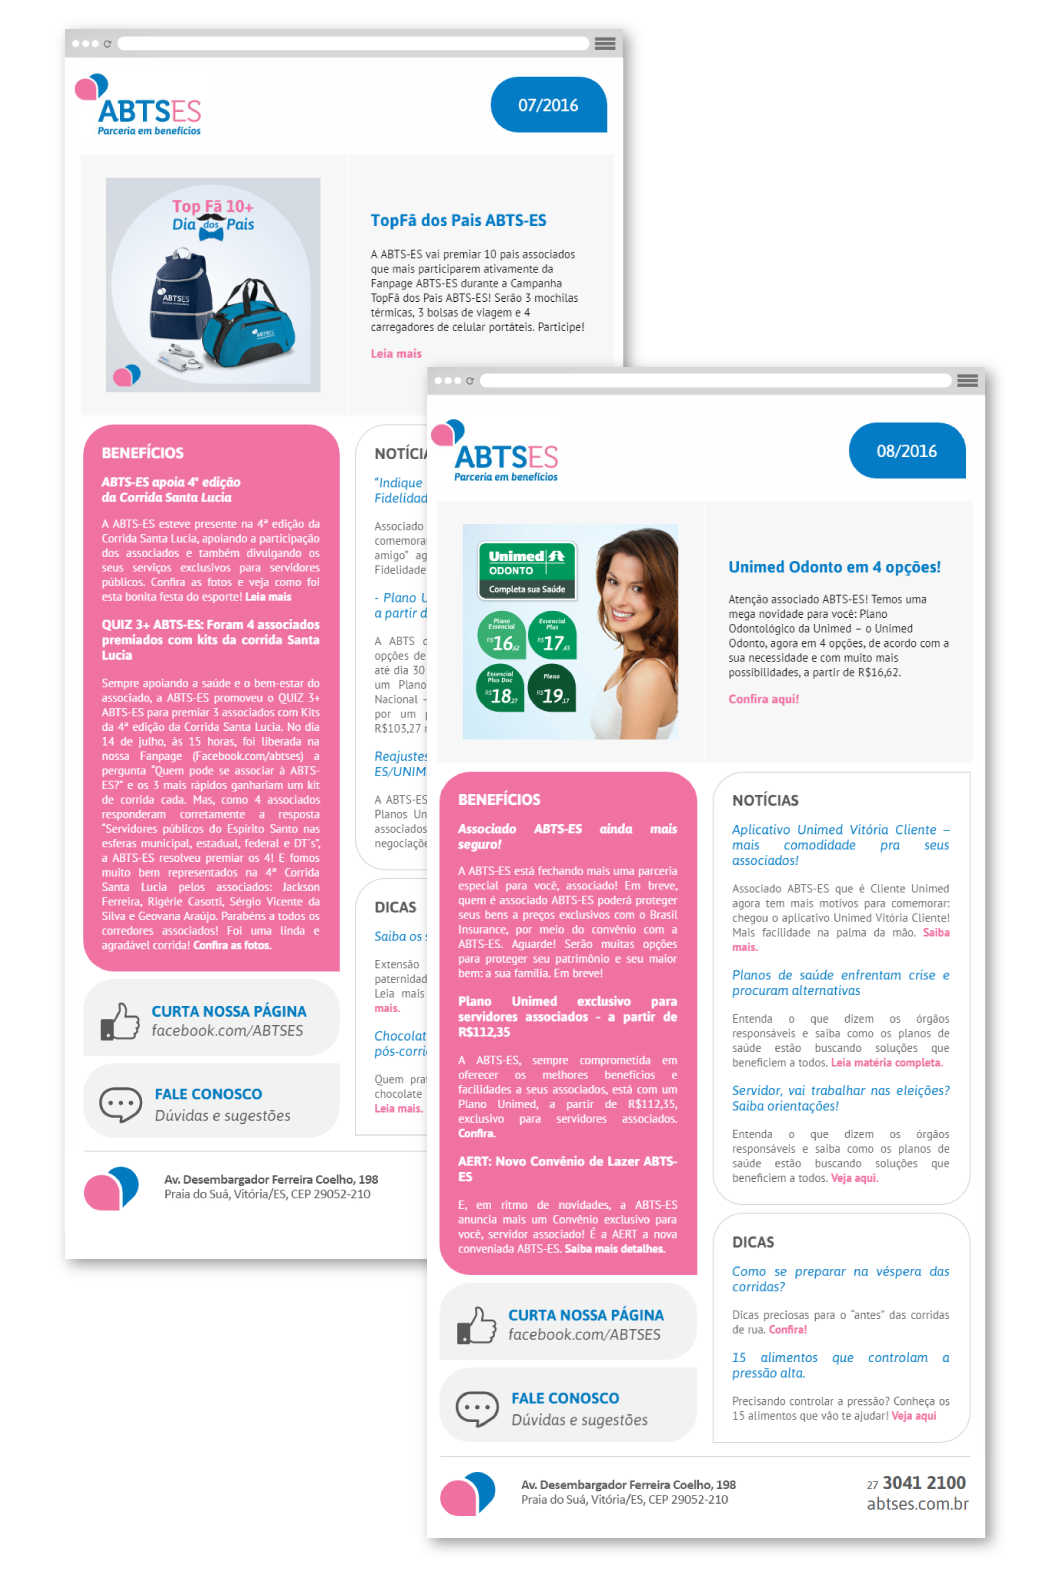 wce-site-novo-2016-portfolio-newsabts-img1